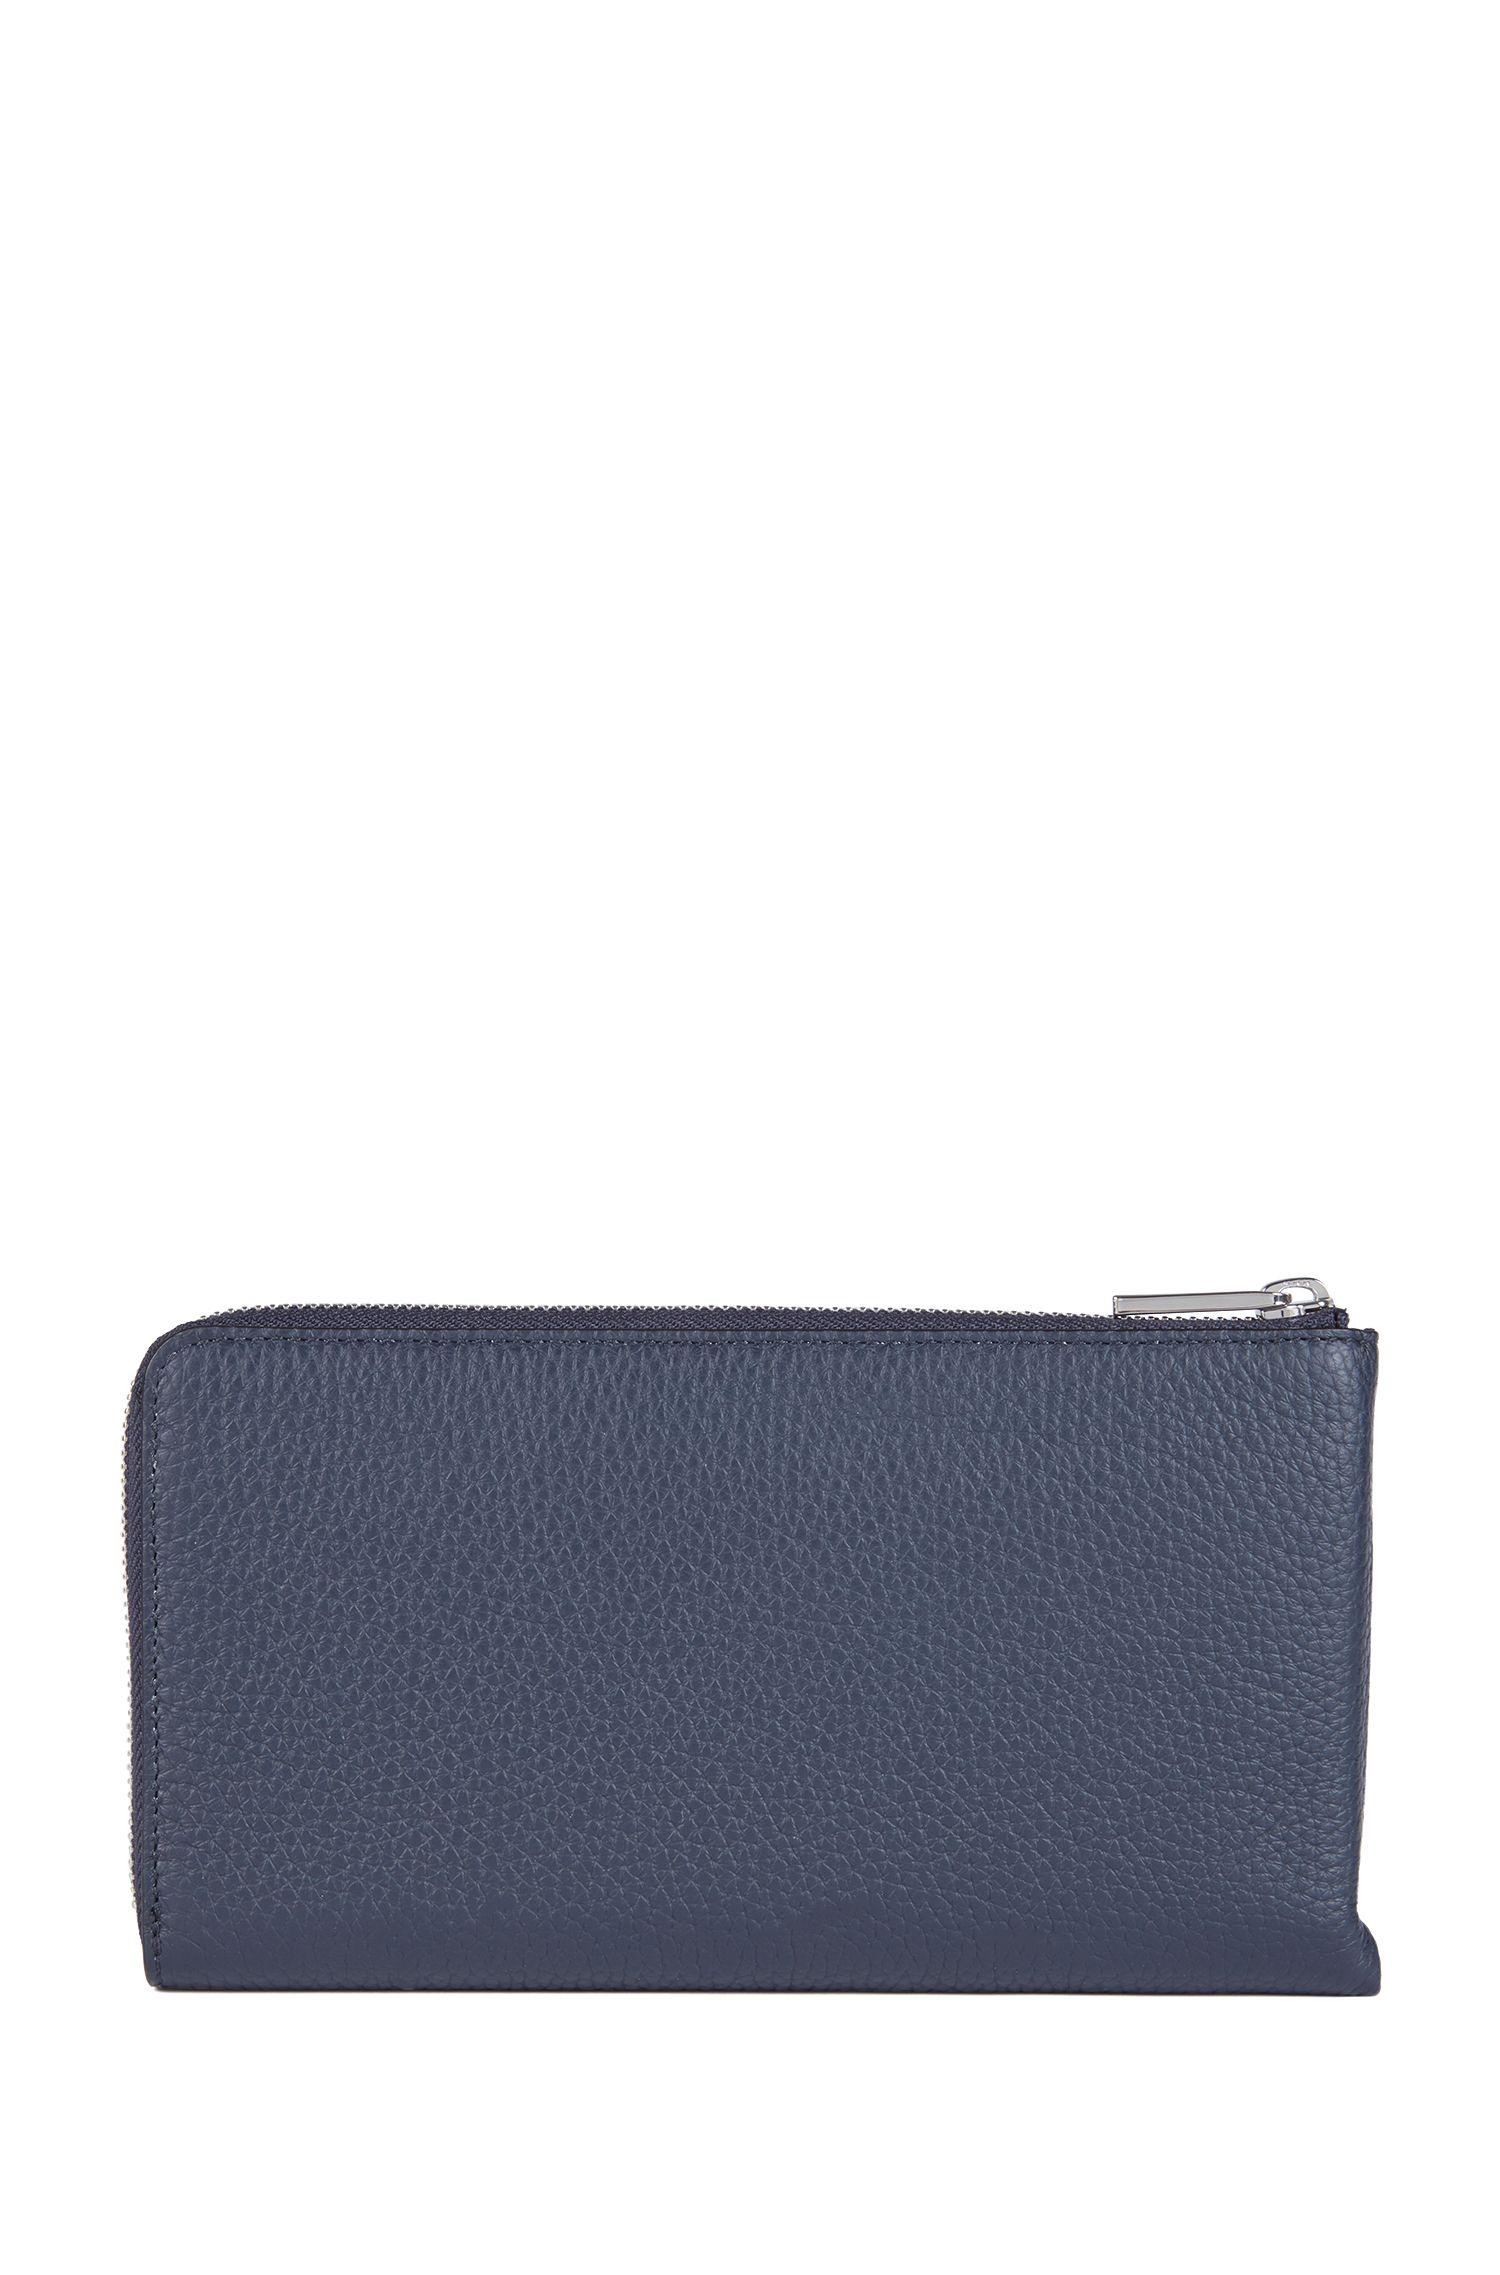 Zip-around travel wallet in embossed Italian leather, Dark Blue